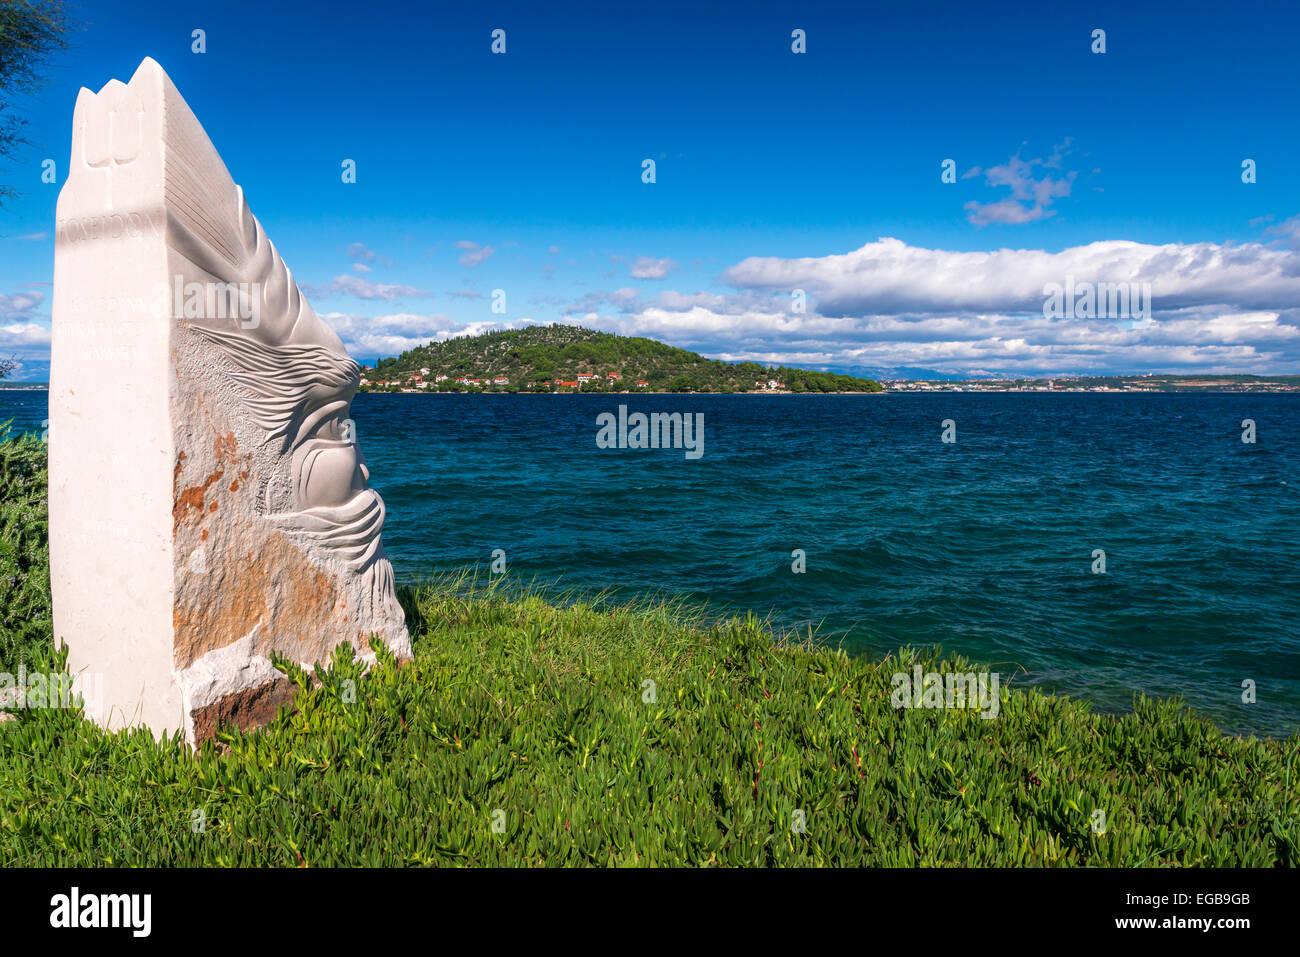 Poseidon statue, Ugljan Island, Dalmatian Coast, Croatia - Stock Image